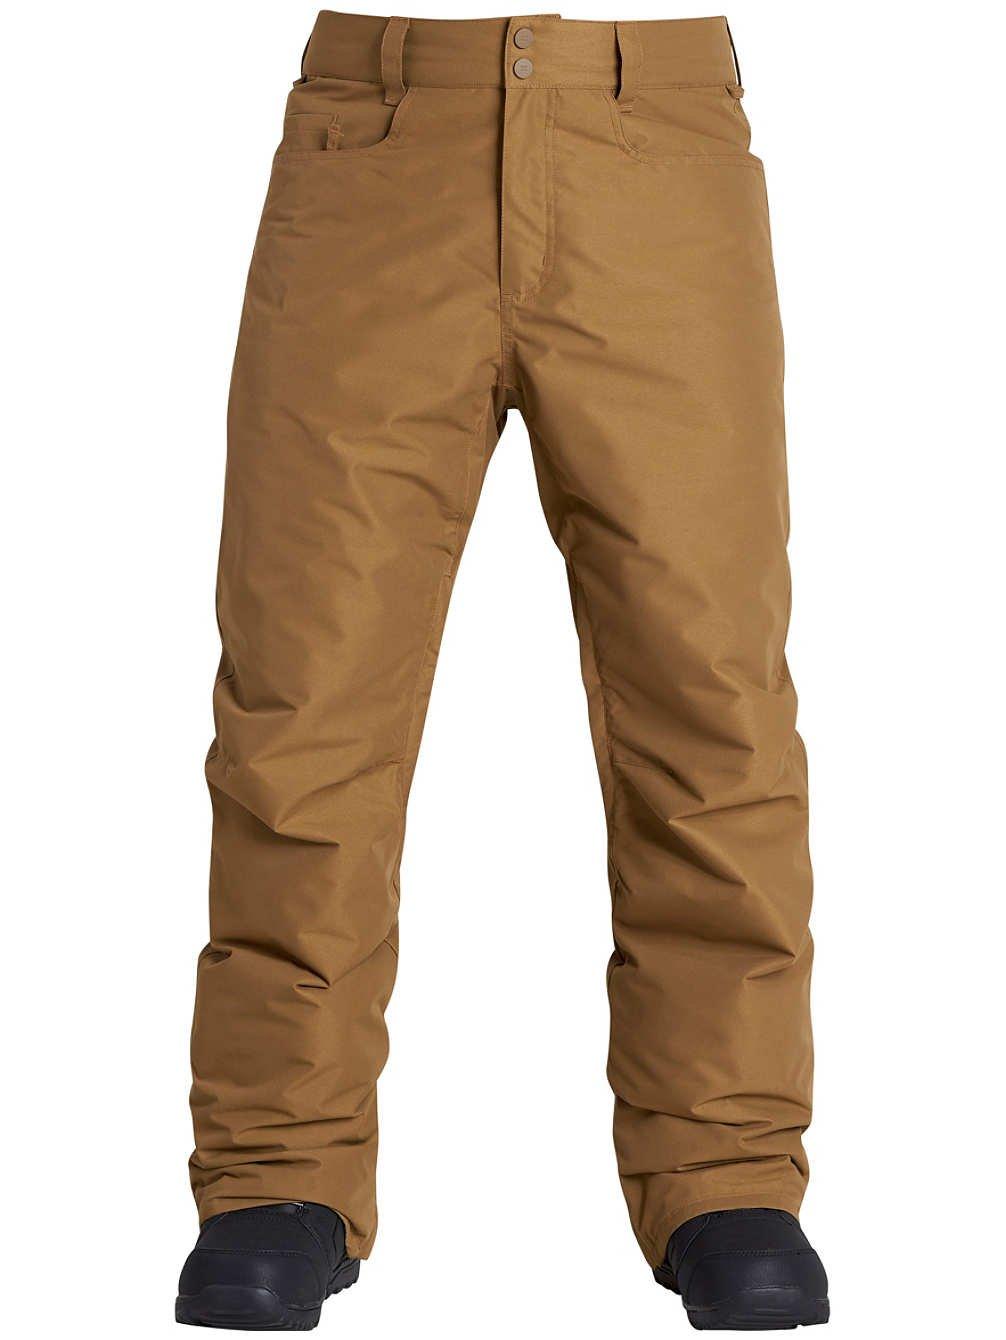 G.S.M. Europe - Billabong Outsider Pantalon de Ski L6PM02